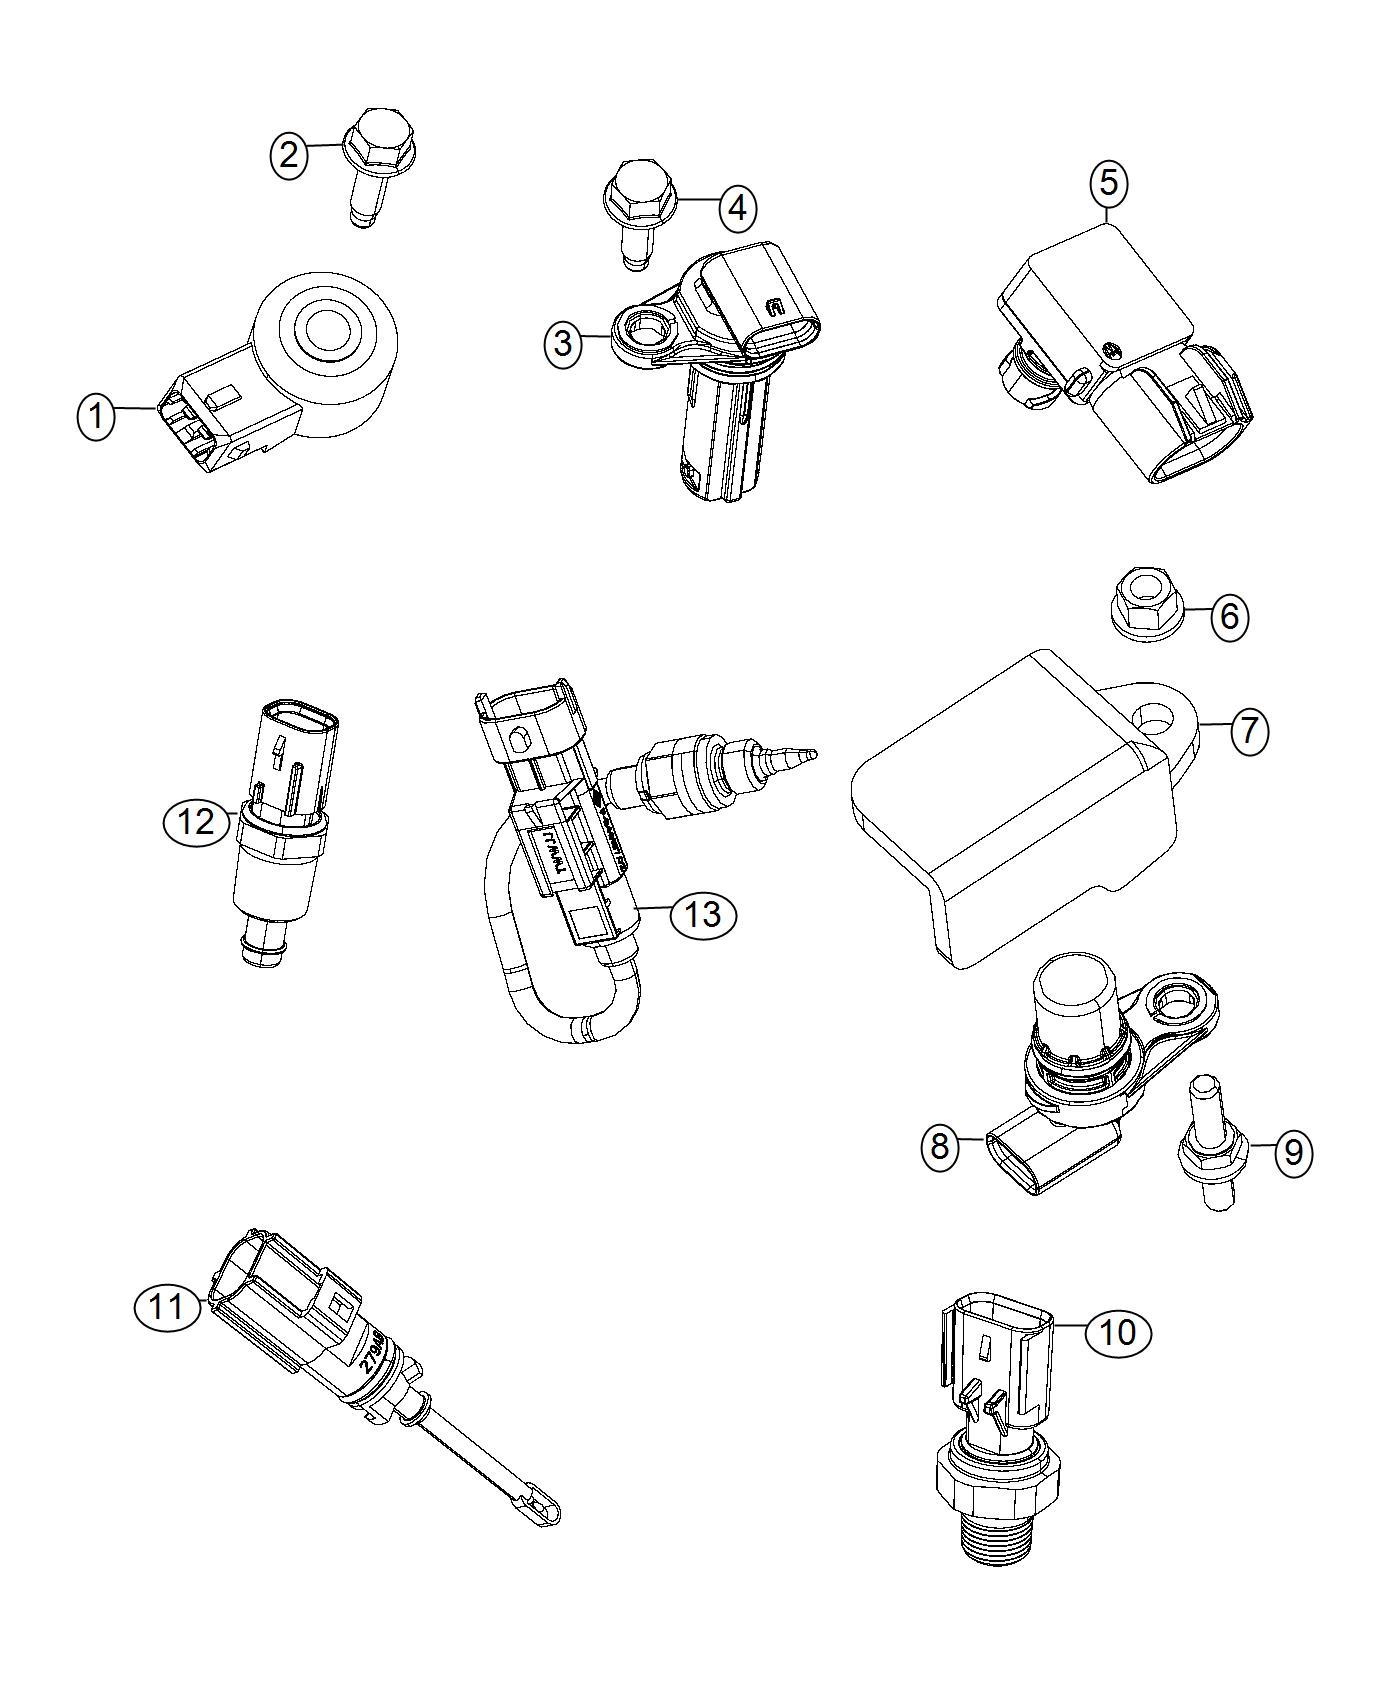 Chrysler 200 Sensor Crankshaft Position Sensors Engine